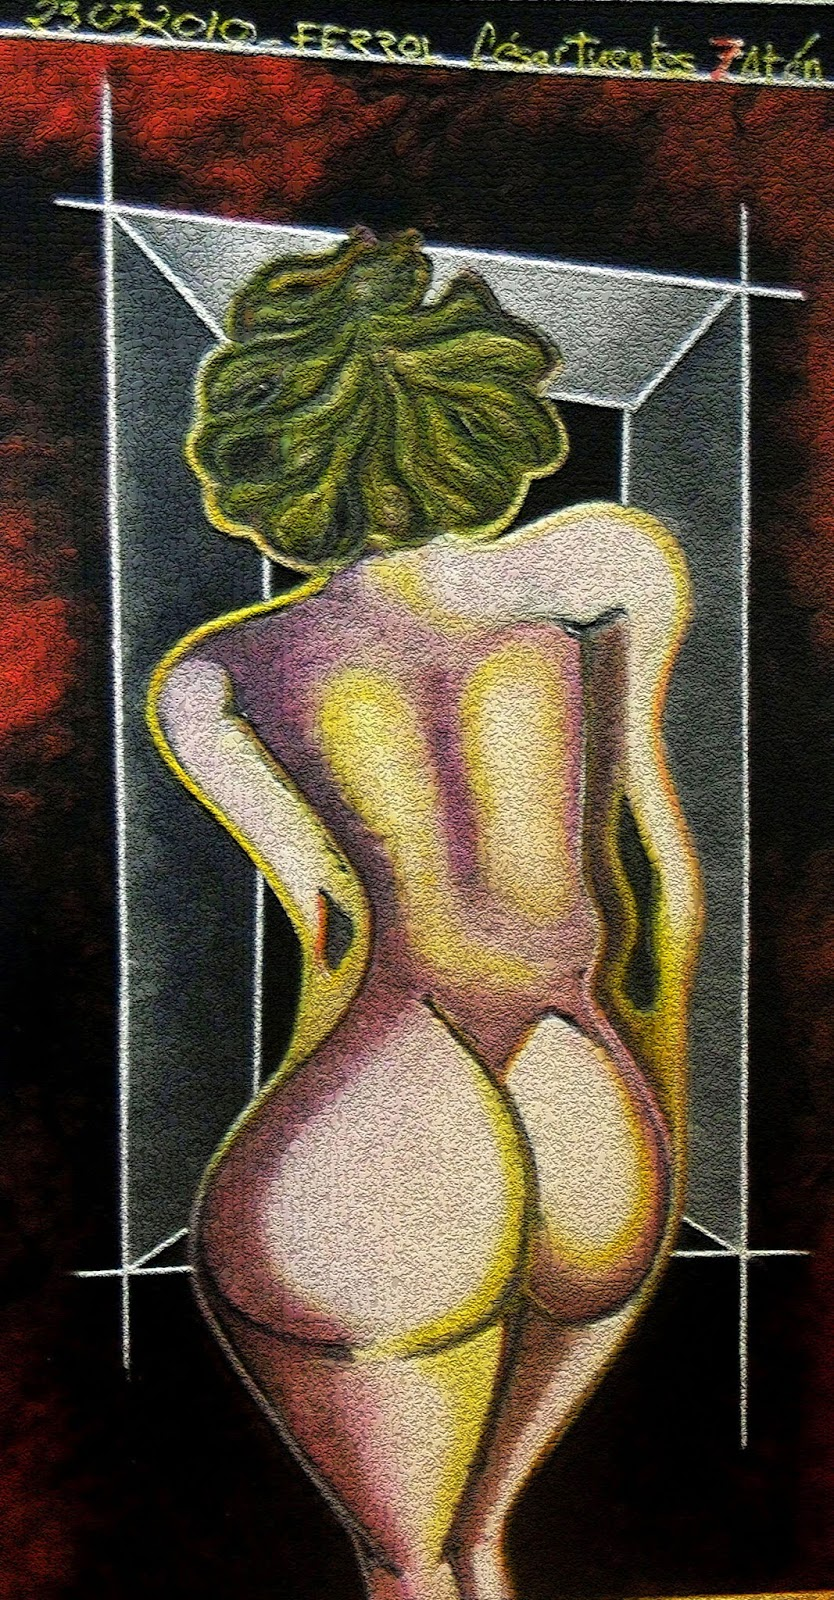 Obra de César Fuentes. Mujer frente a la ventana.